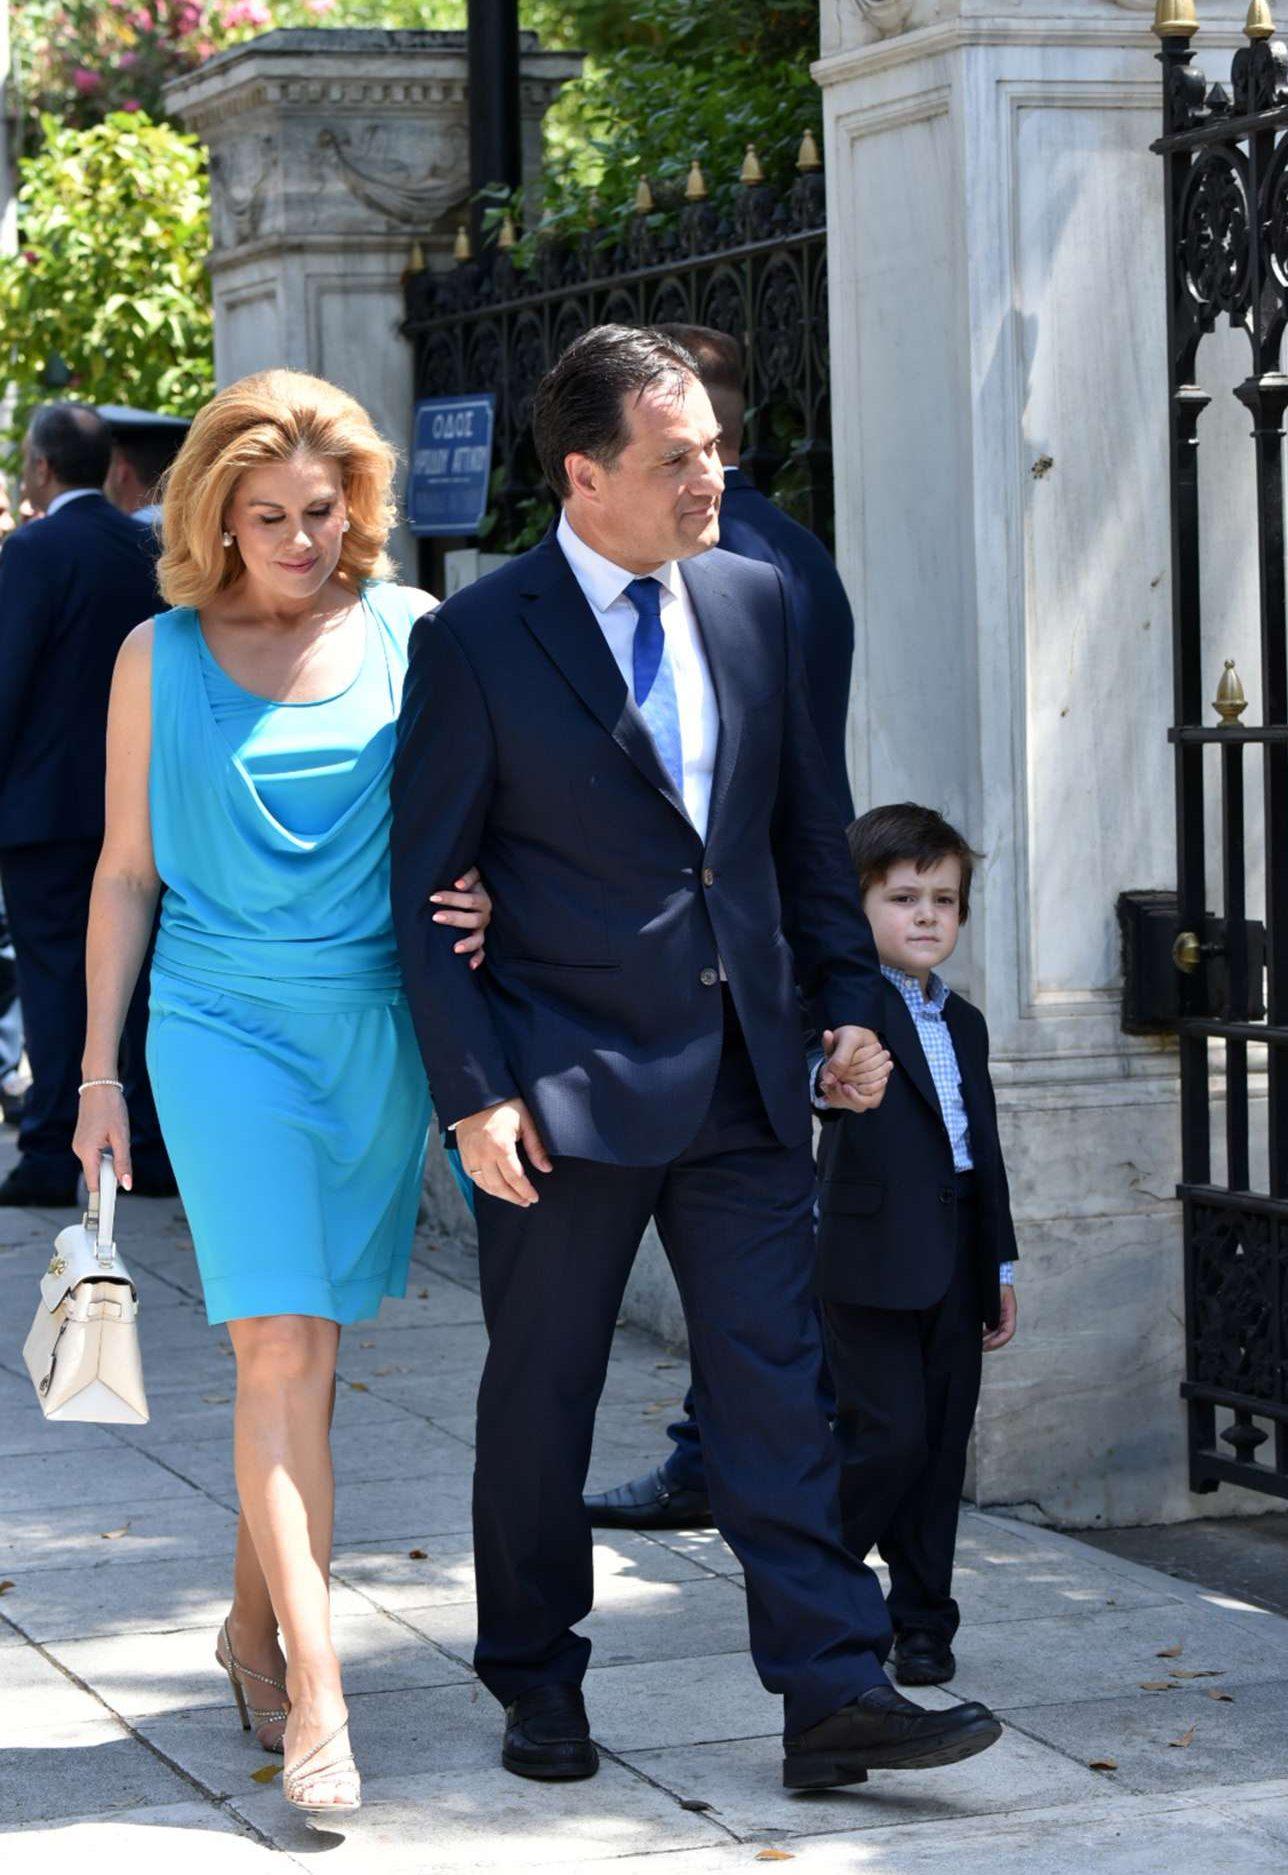 O Αδωνις Γεωργιάδης, υπουργός Ανάπτυξης και Επενδύσεων, έξω από το Προεδρικό με τη σύζυγό του Ευγενία Μανωλίδου και τον γιο τους